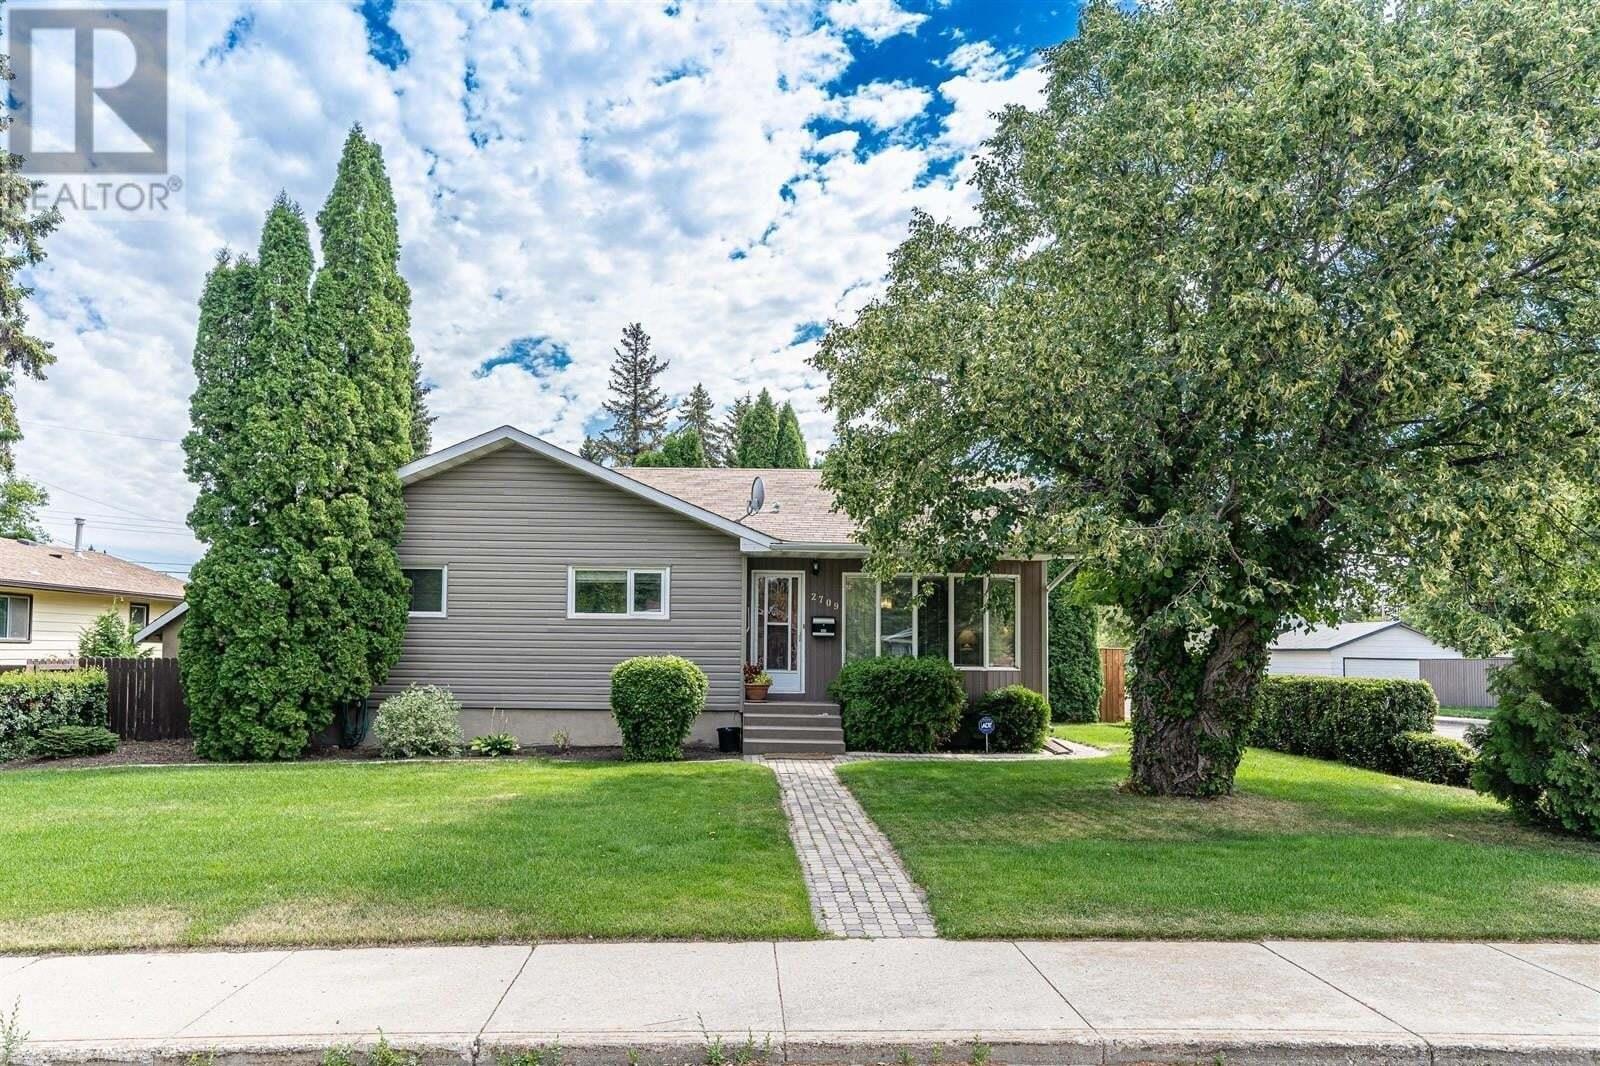 House for sale at 2709 Cumberland Ave S Saskatoon Saskatchewan - MLS: SK821487